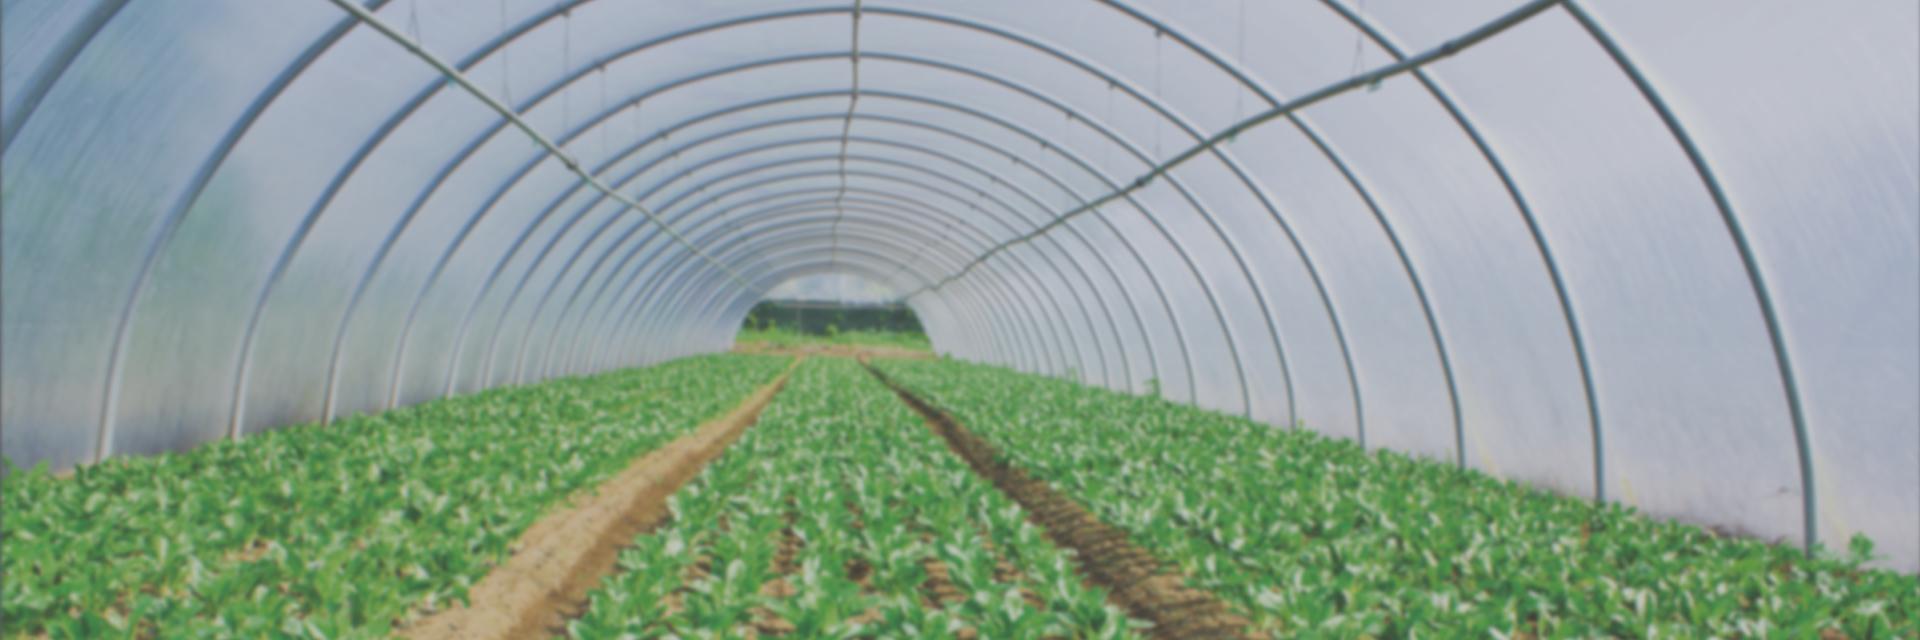 Plastic greenhouse structure